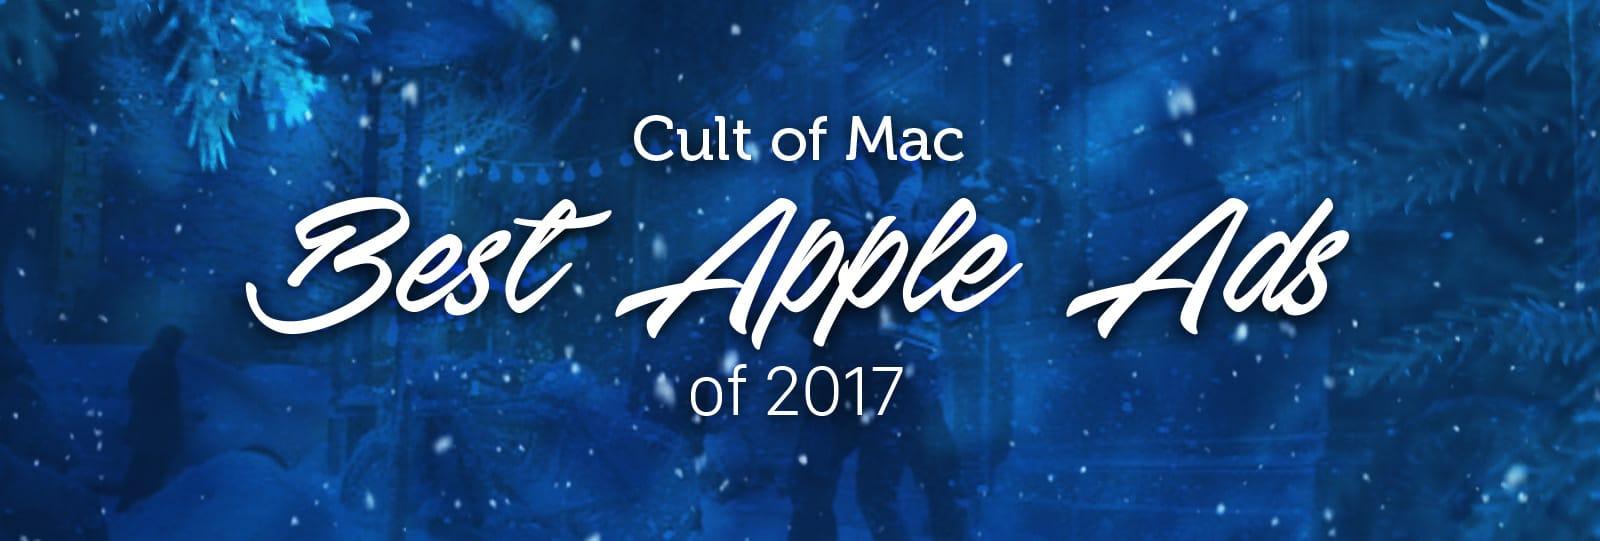 Best Apple ads of 2017